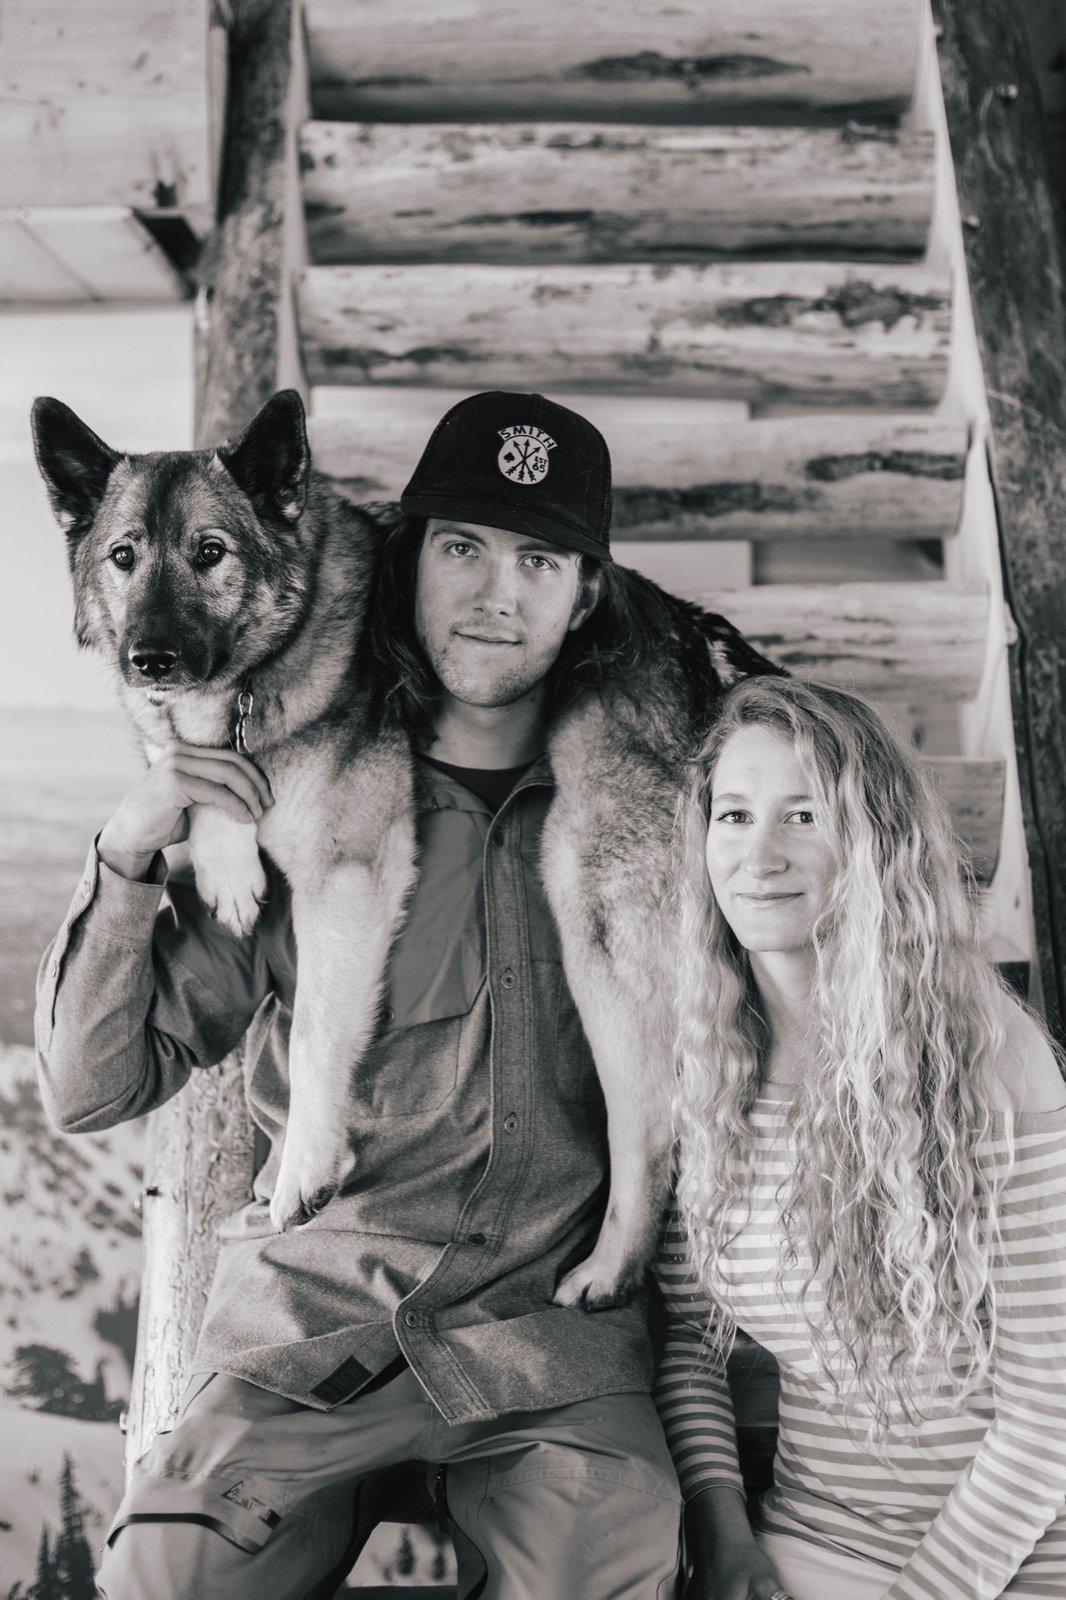 Zach and Cindi Lou Grant